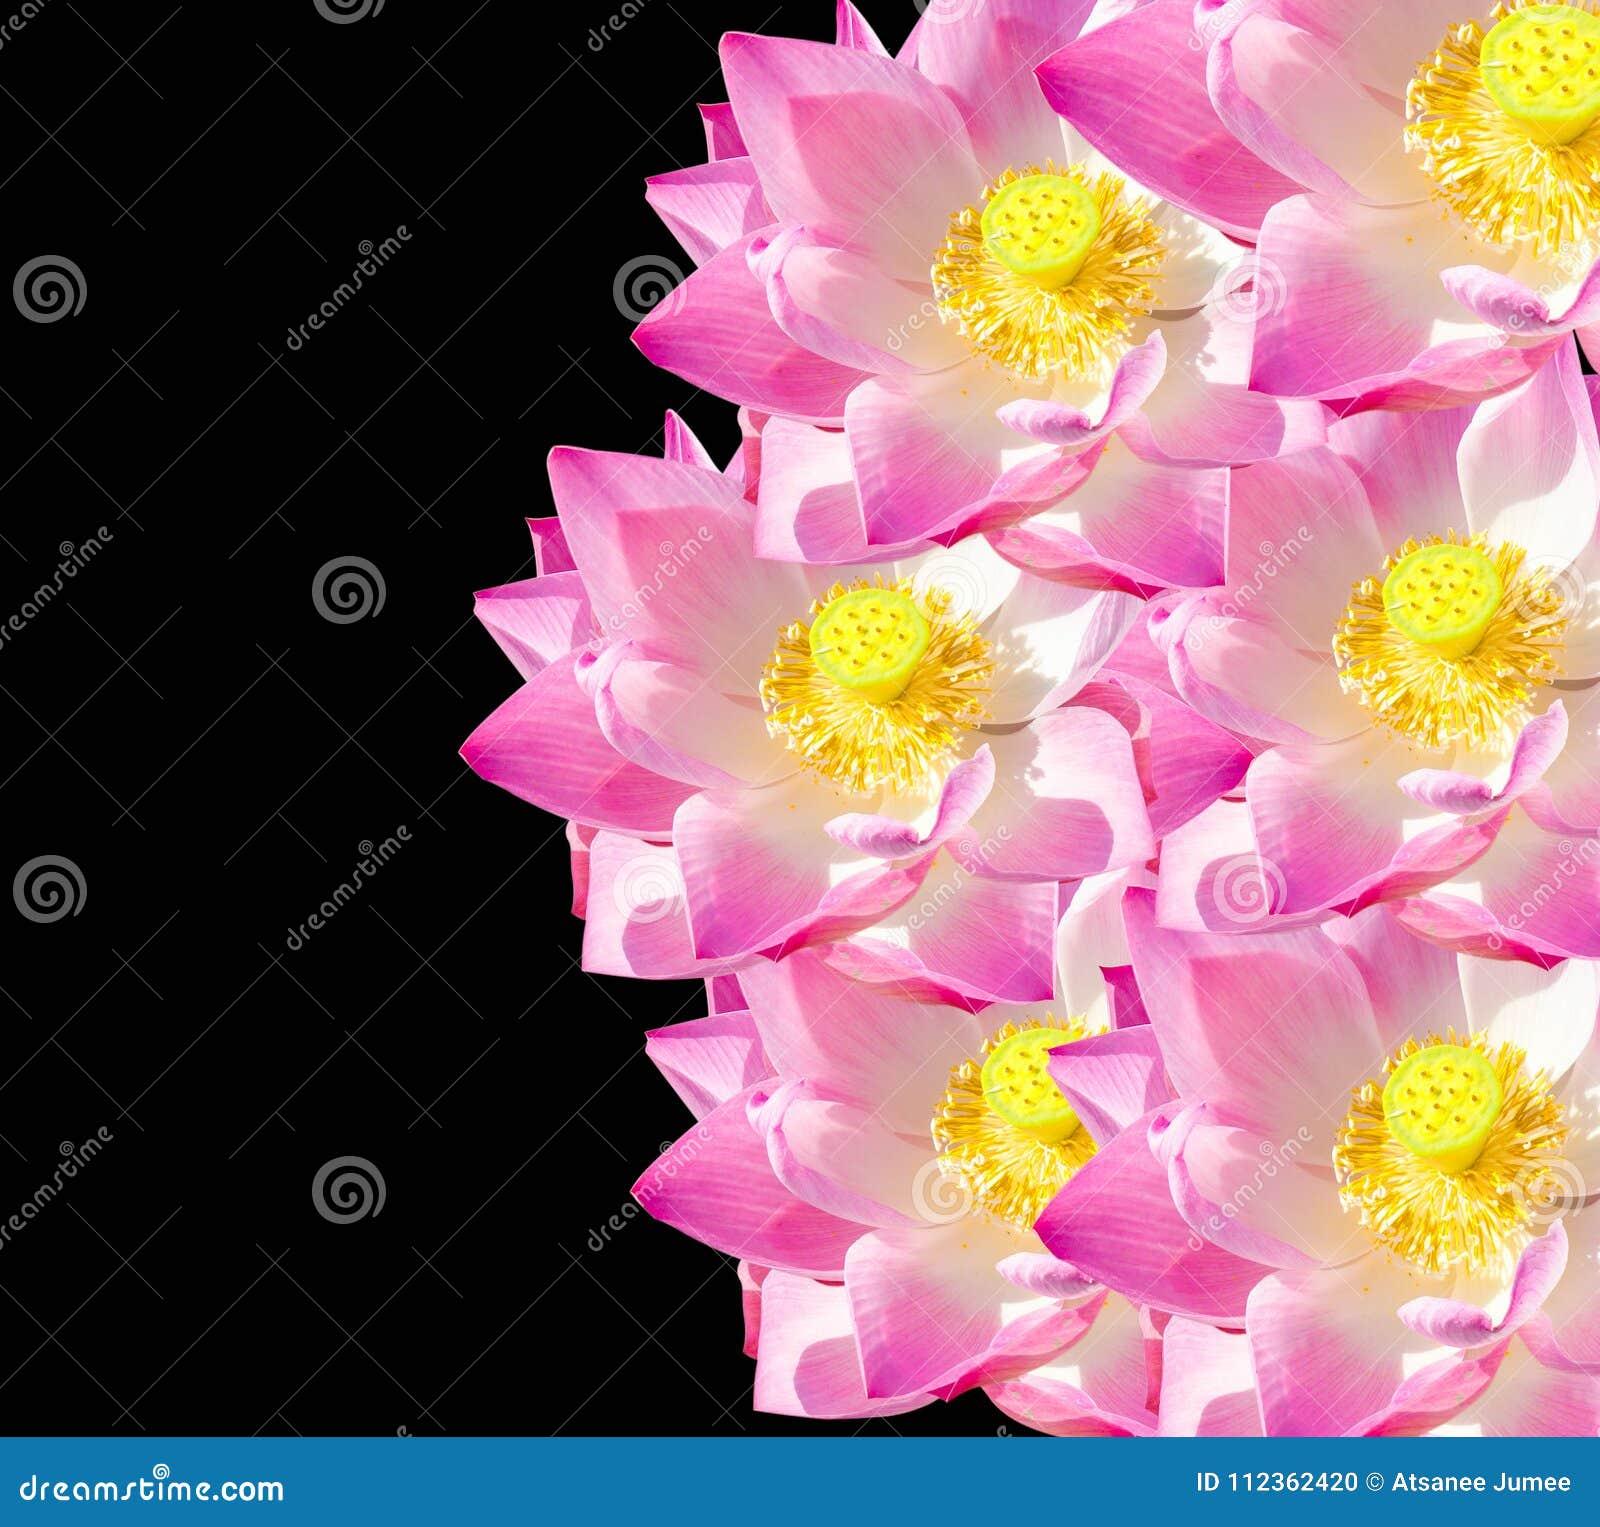 Lotus Flower On Black Background